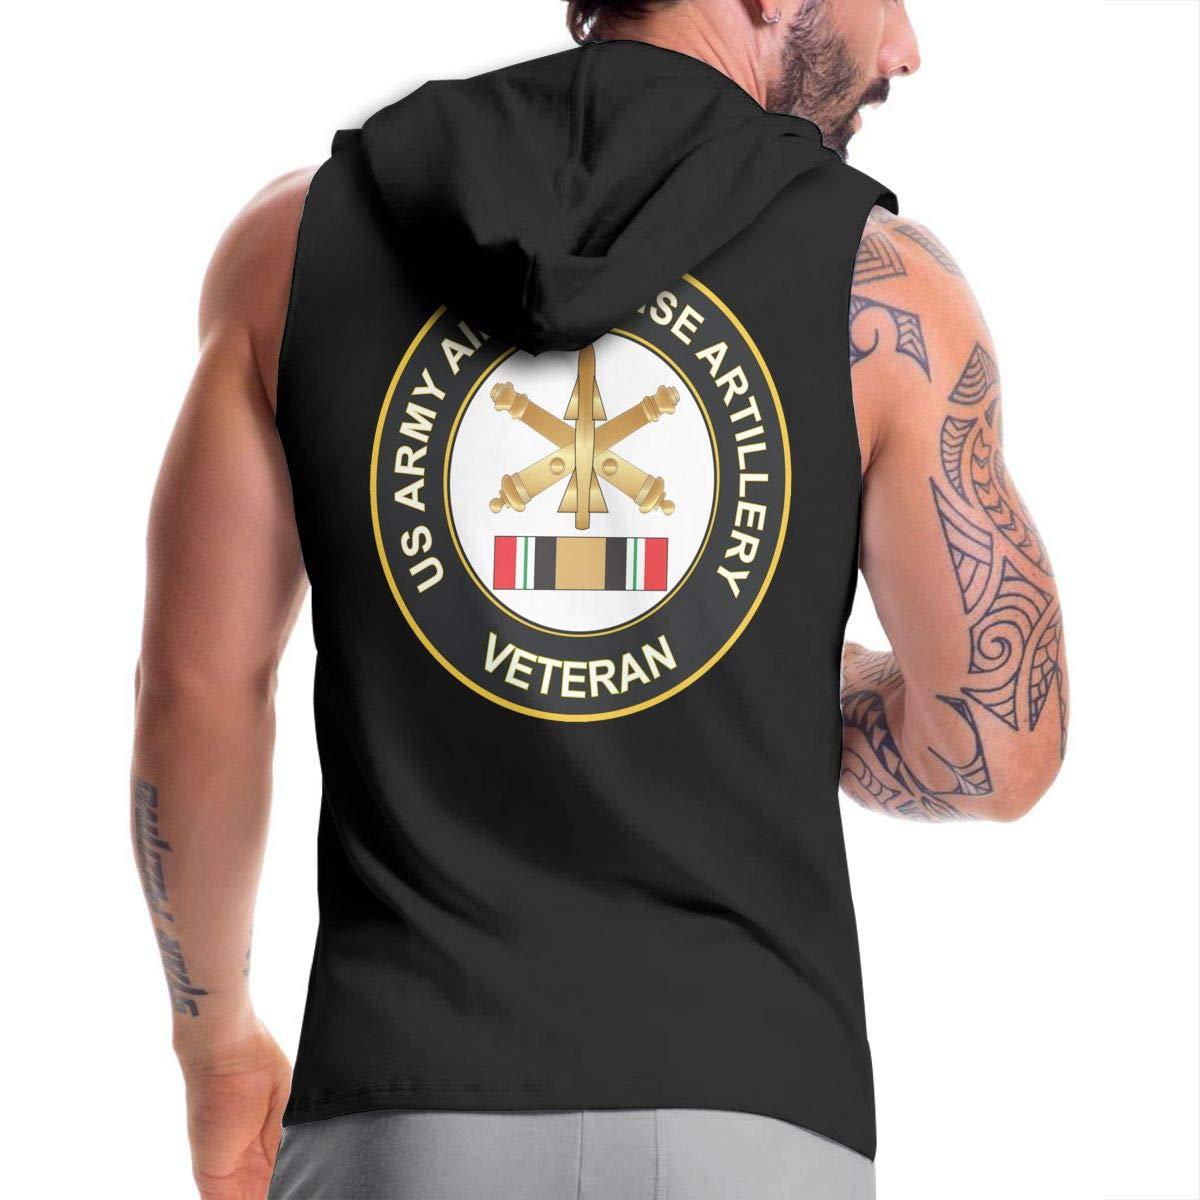 NMBOJR Army Air Defense Artillery Iraq Veteran Mens Hipster Hip Hop Hoodies Shirts